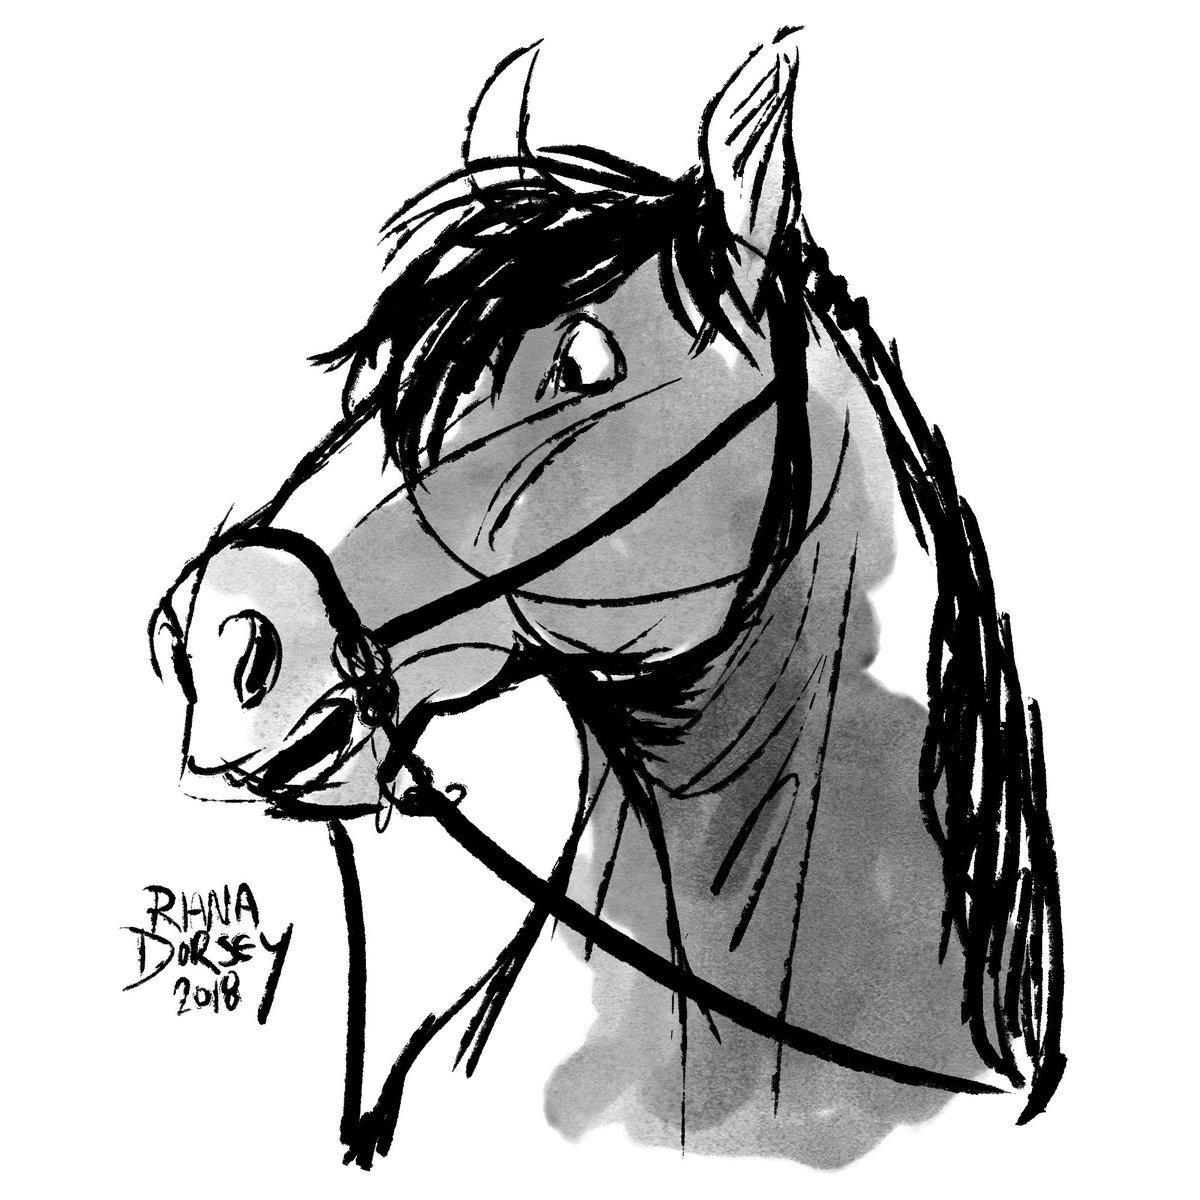 I was gonna do more realism but today I was like 'nah' so here's a cartoony pony ♥ #inktober #inktoberday2